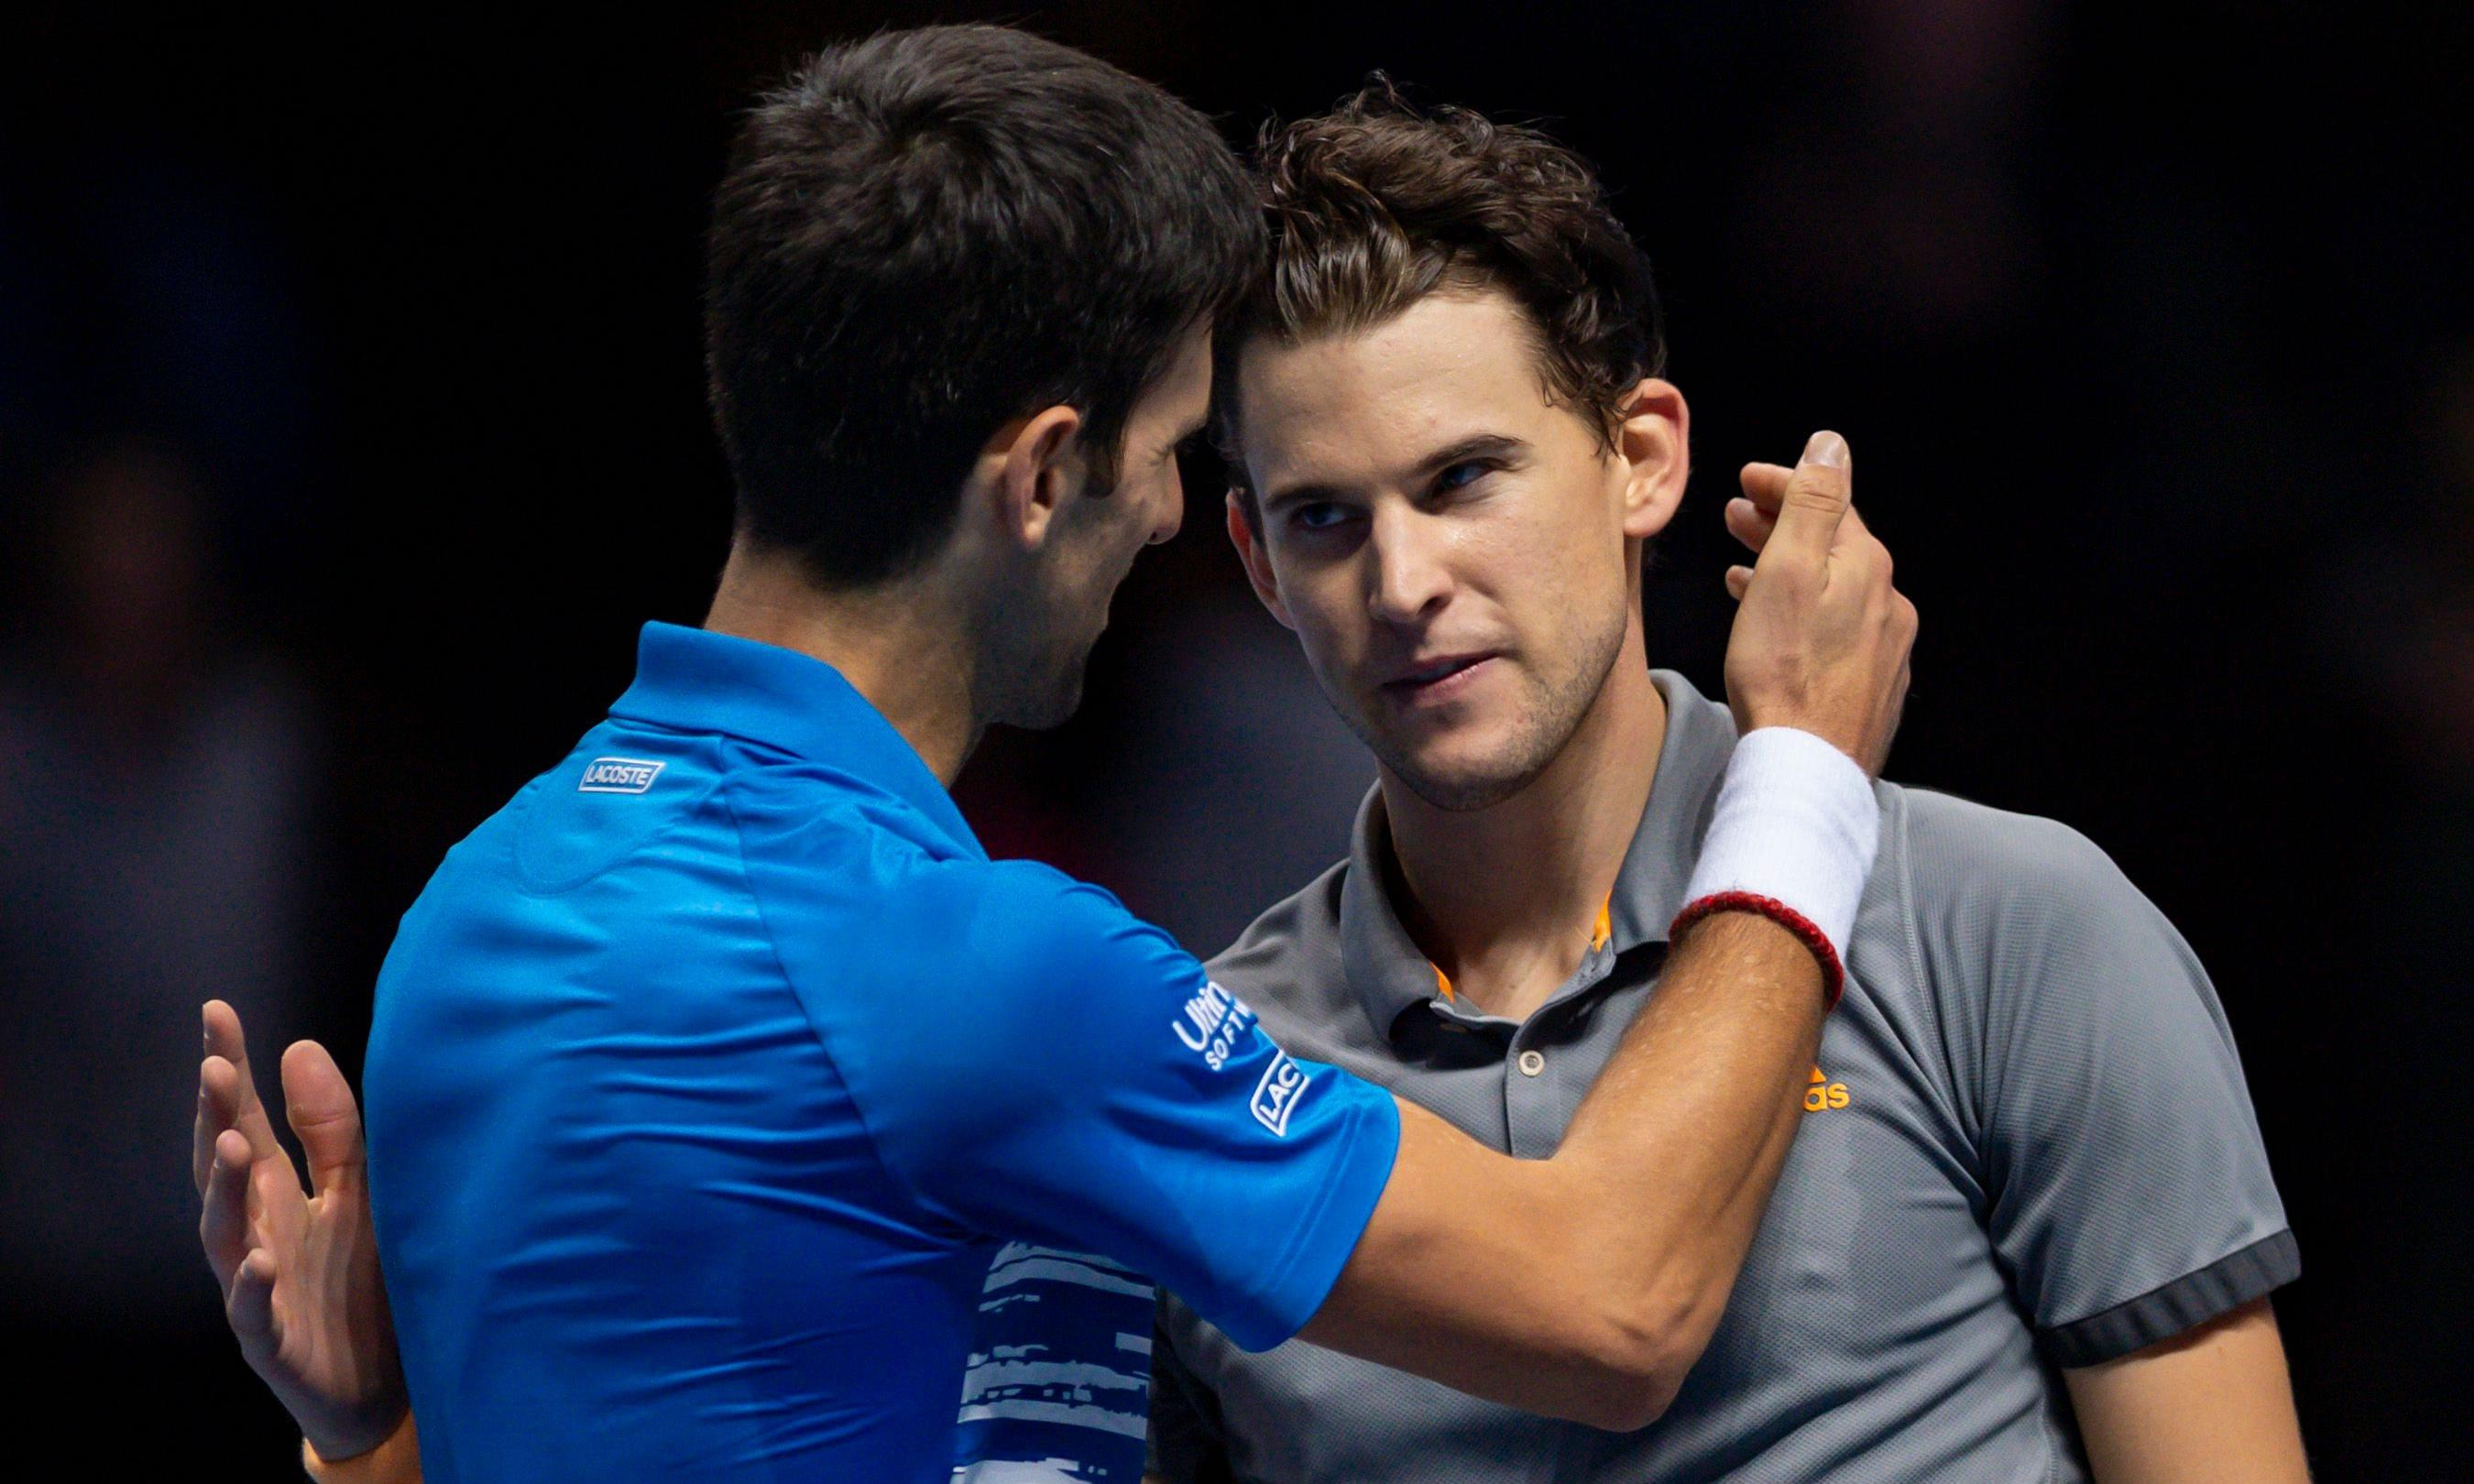 Novak Djokovic falls to Dominic Thiem before Roger Federer showdown